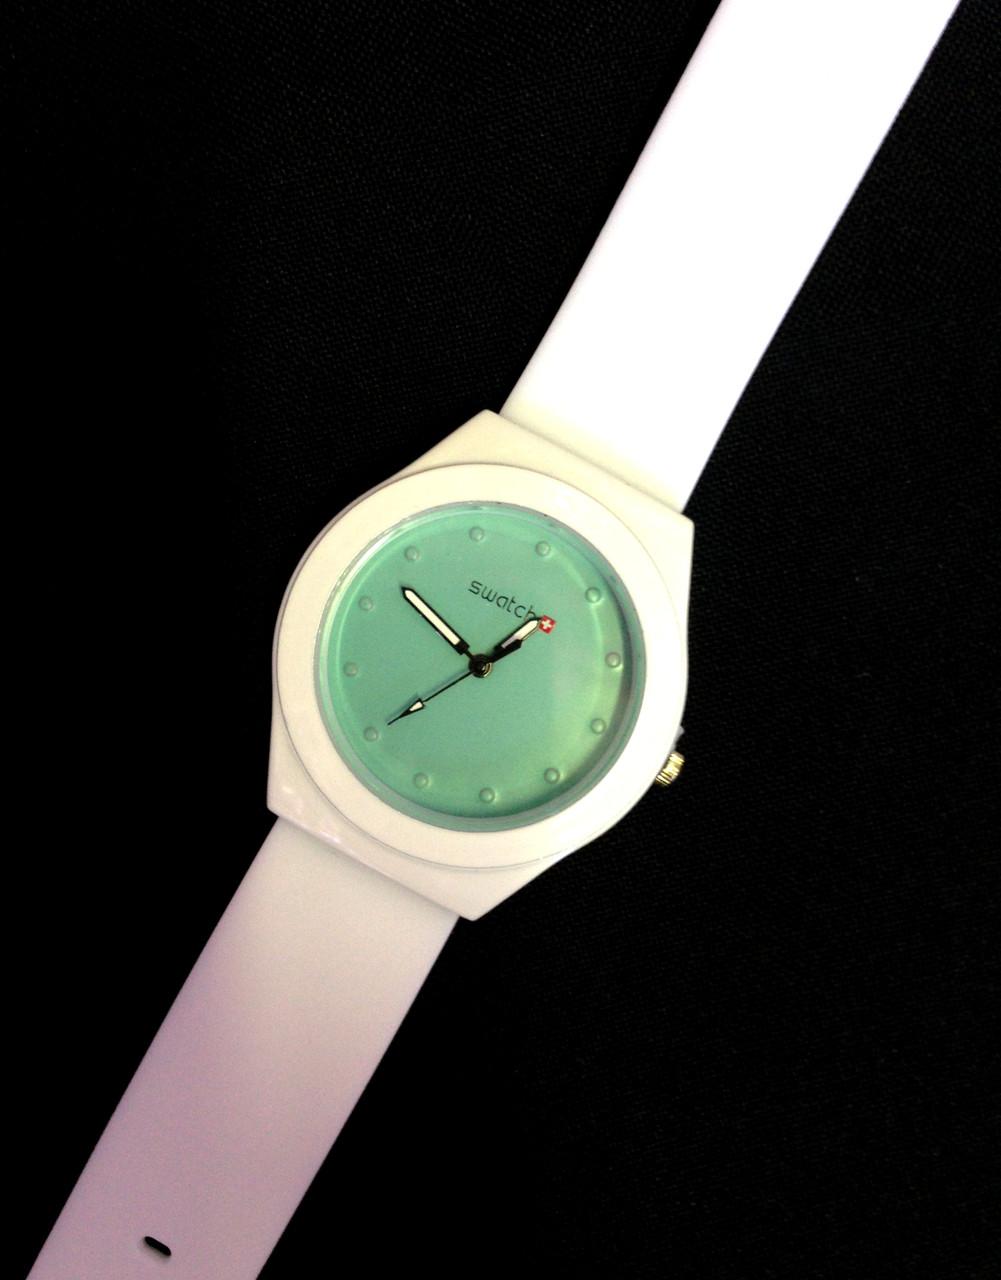 Женские часы SWATCH, кварцевые белые